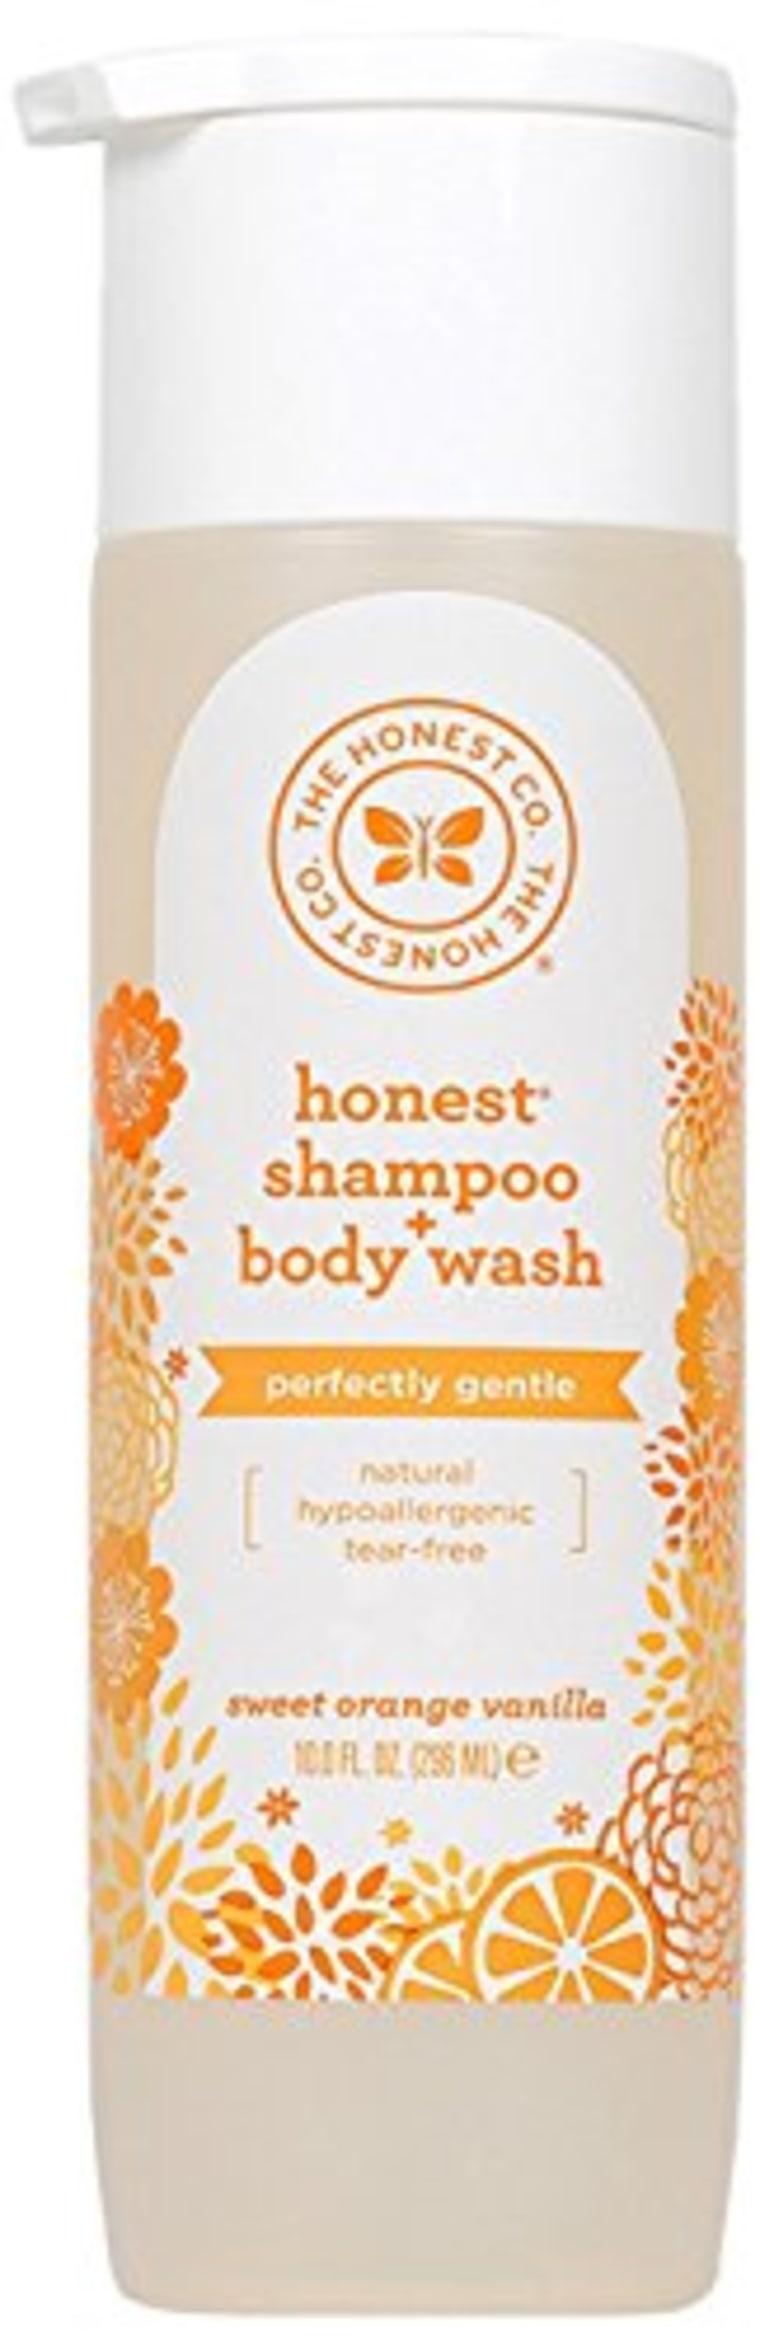 Honest Shampoo and Body Wash